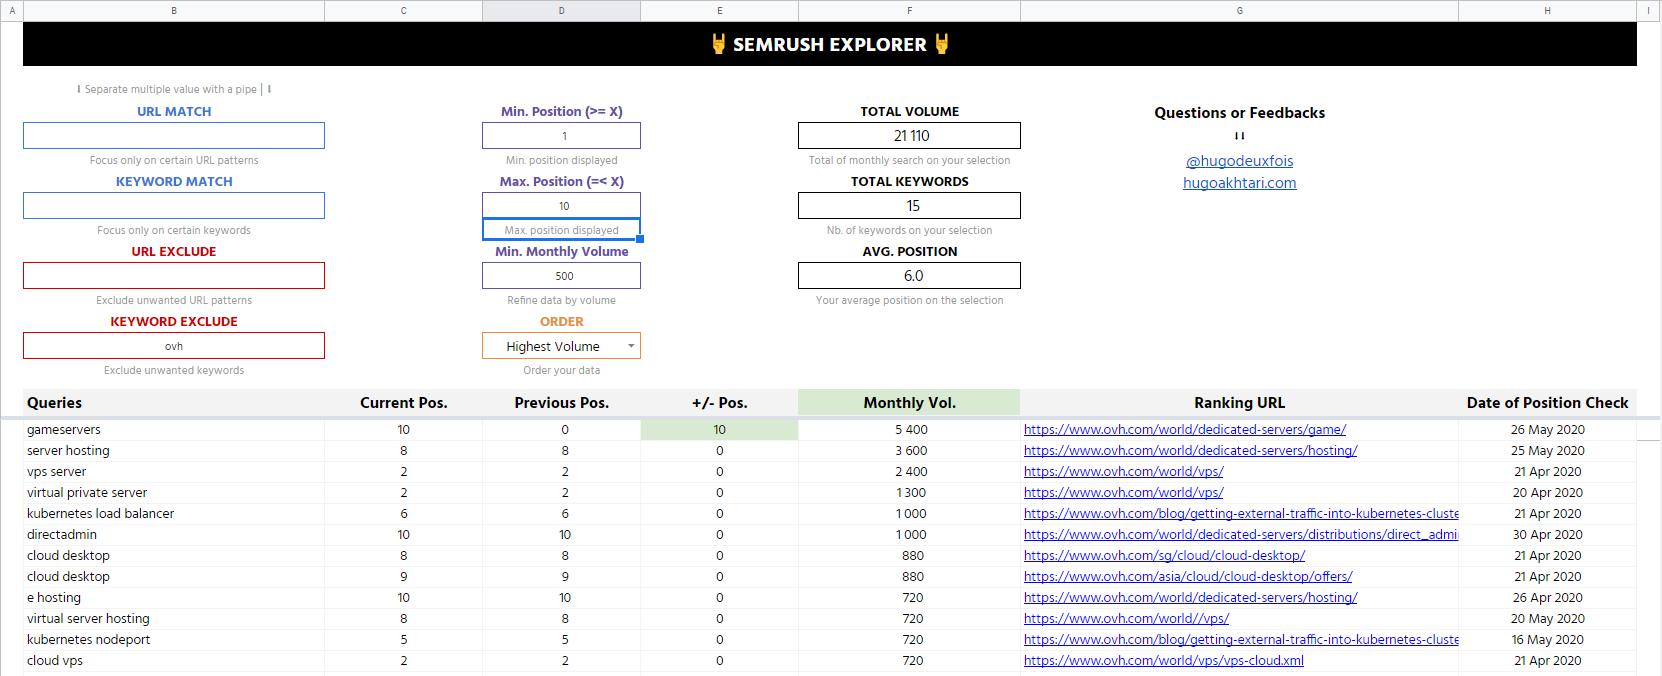 semrush_explorer_hugoakhtari